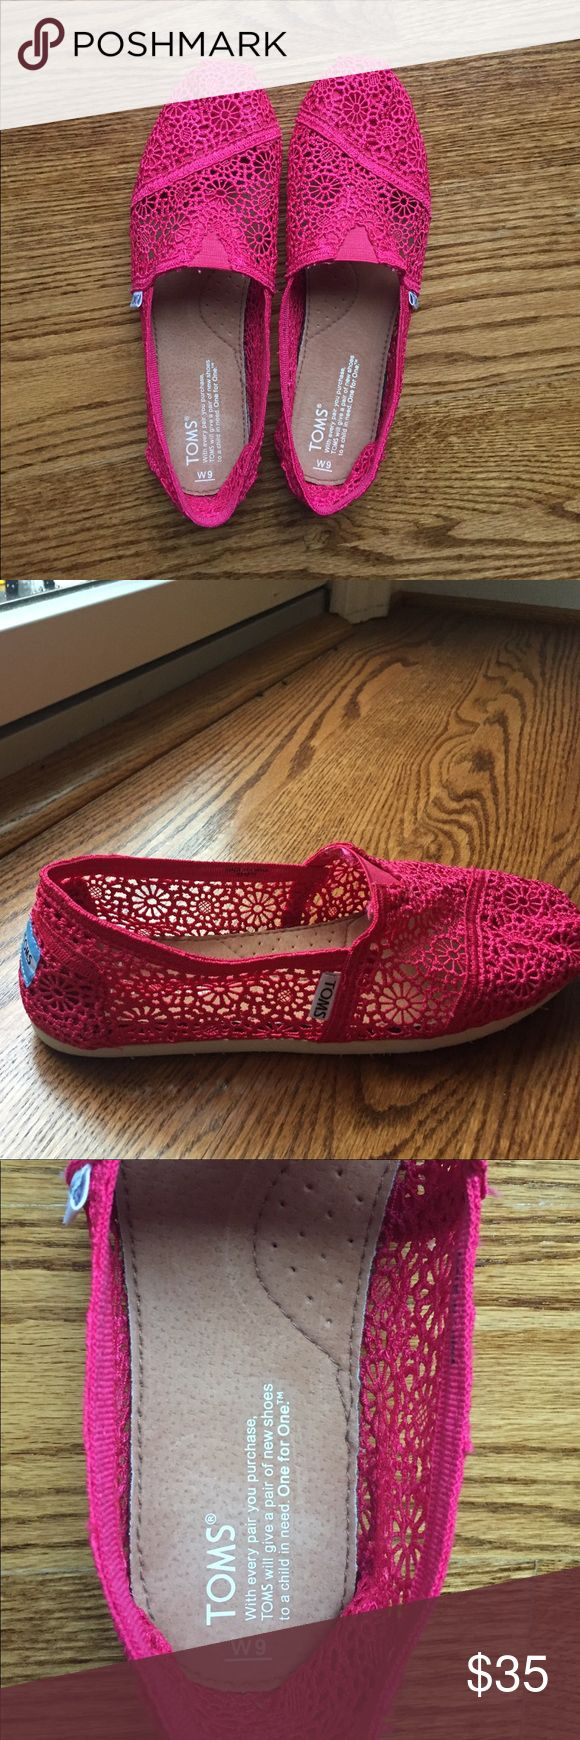 Toms Crochet shoes NWOT Never worn! But no tags Toms Shoes